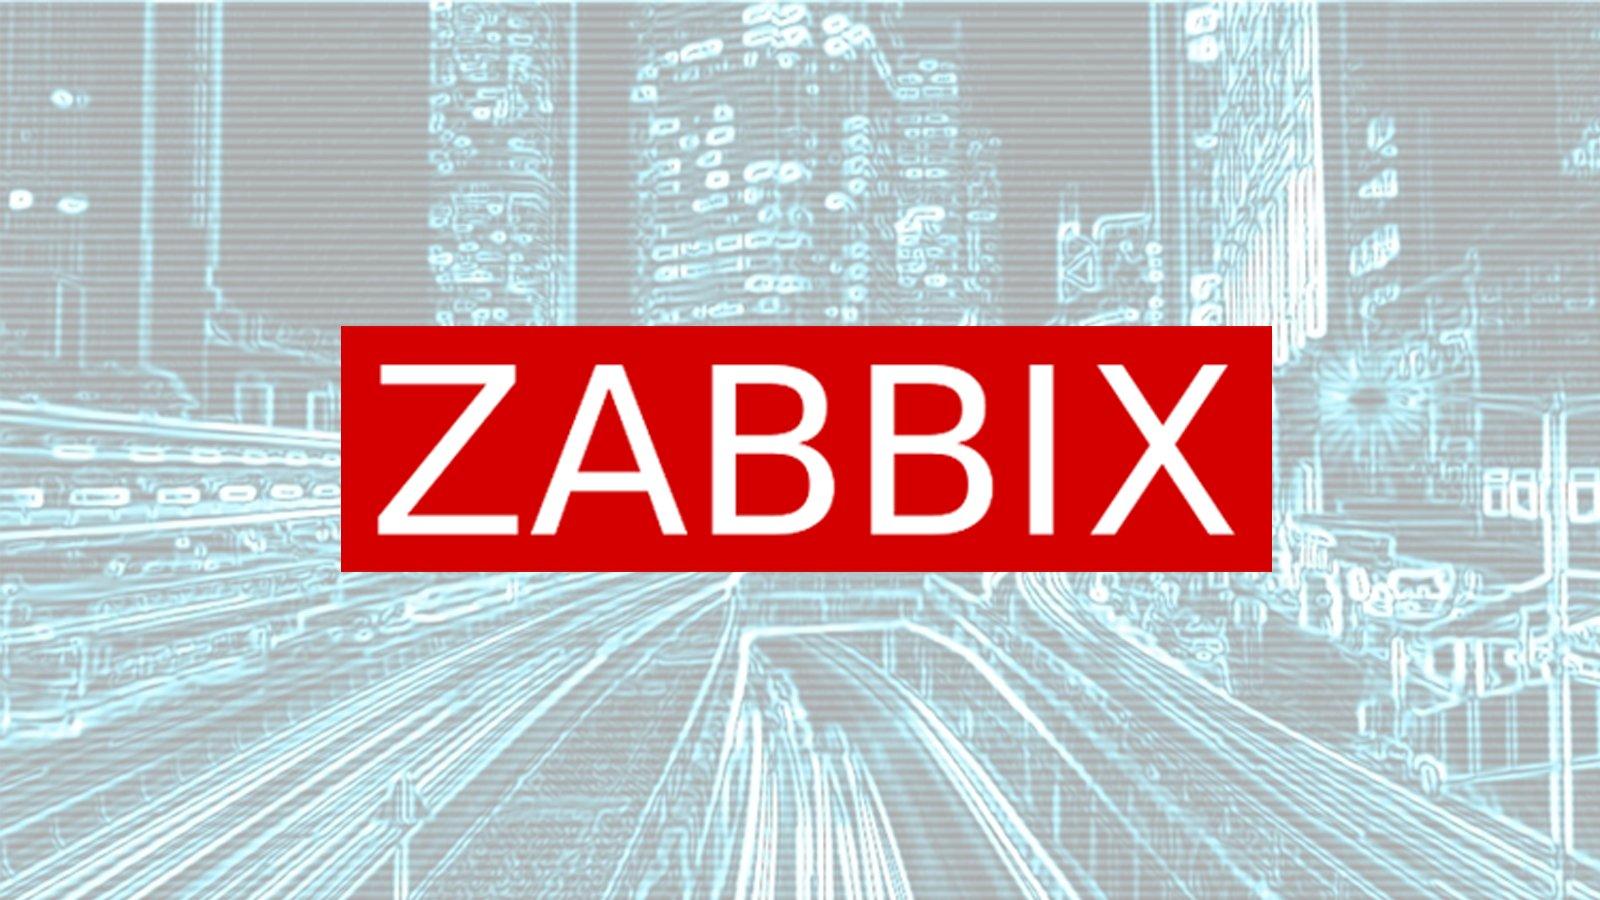 Zabbix 5 Application And Network Monitoring Sean Bradley Skillshare